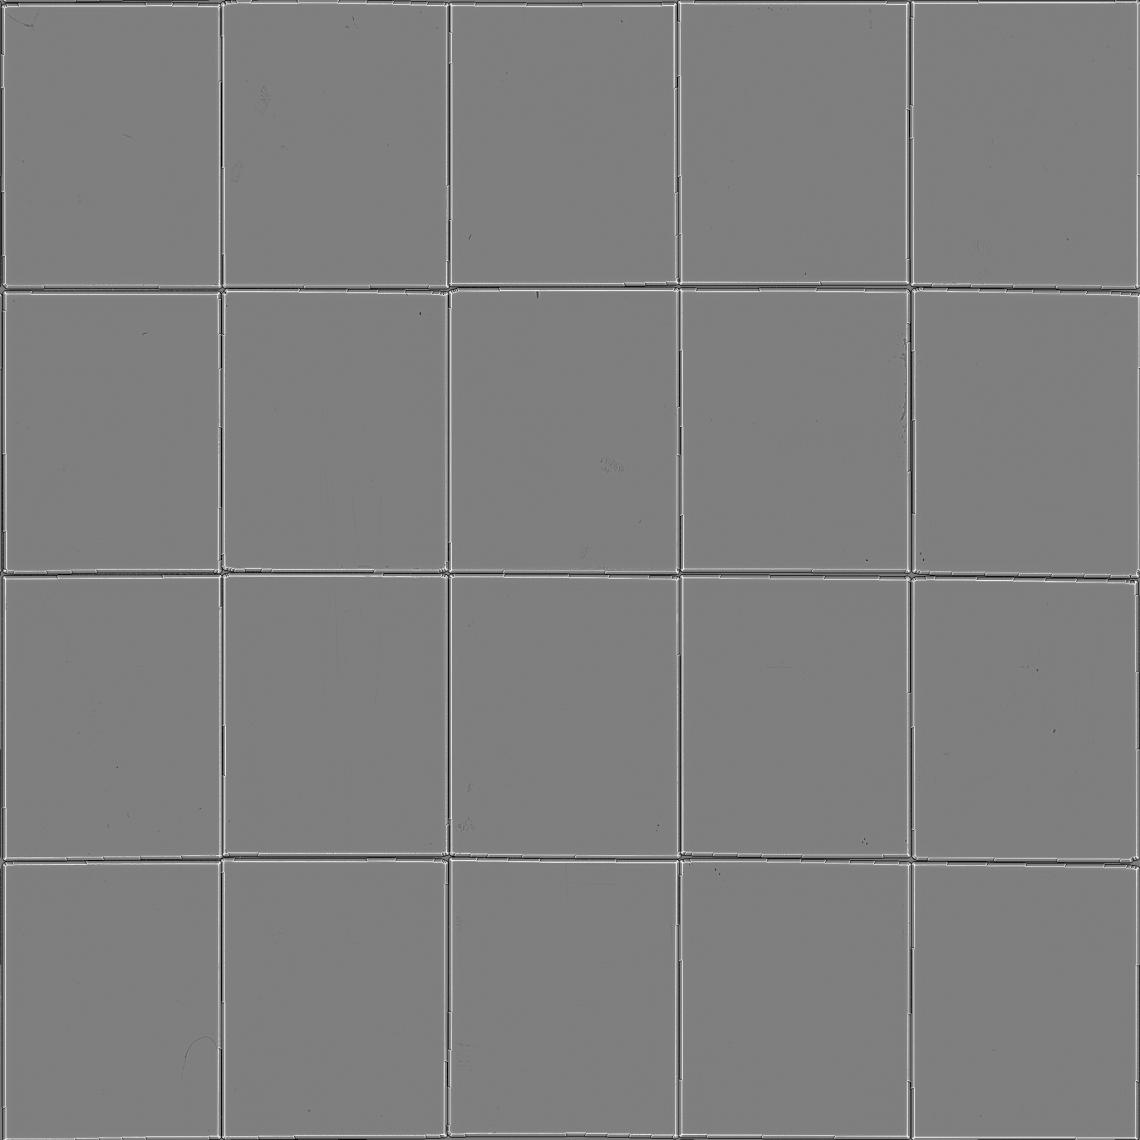 Simple-Tiles-03-Curvature